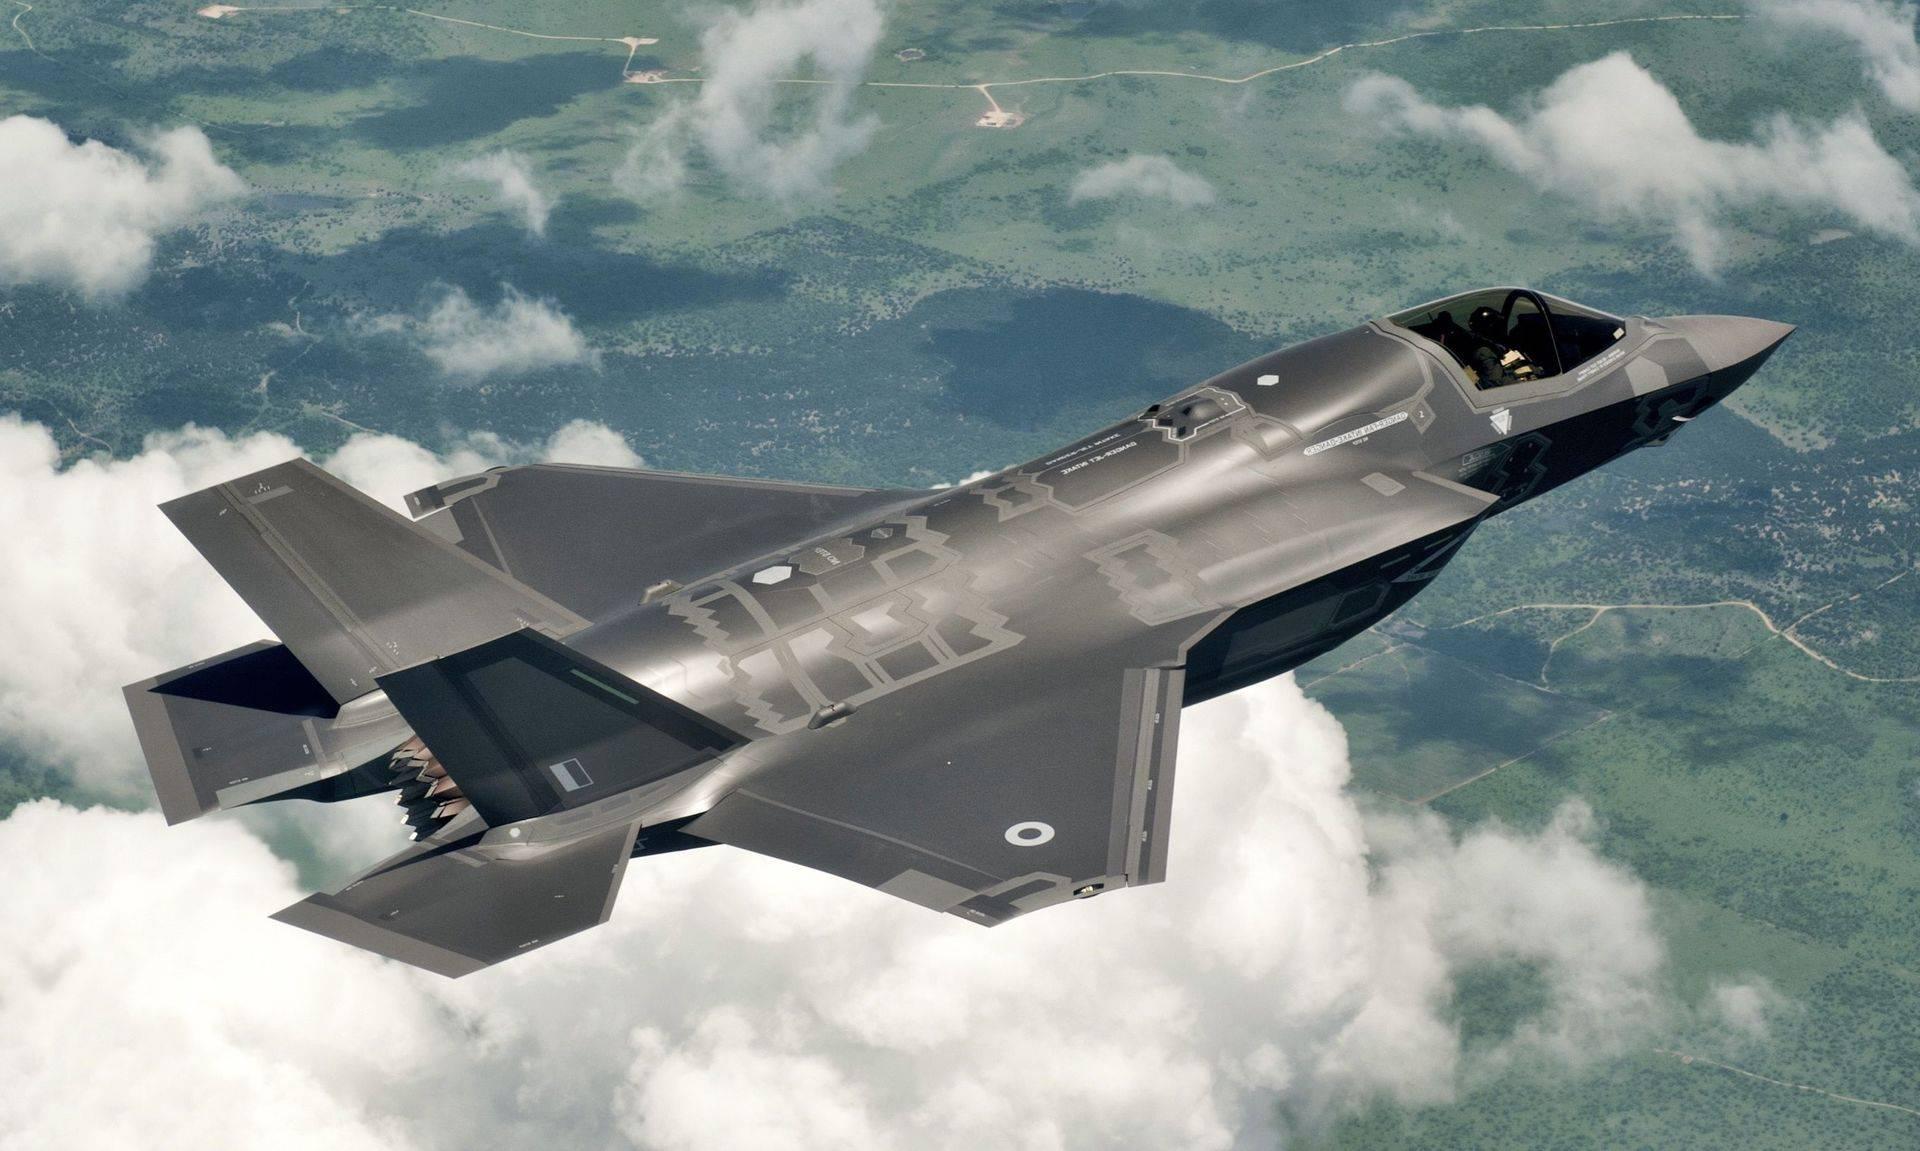 F-35 lightning ii - lockheed martin. фото. характеристики.